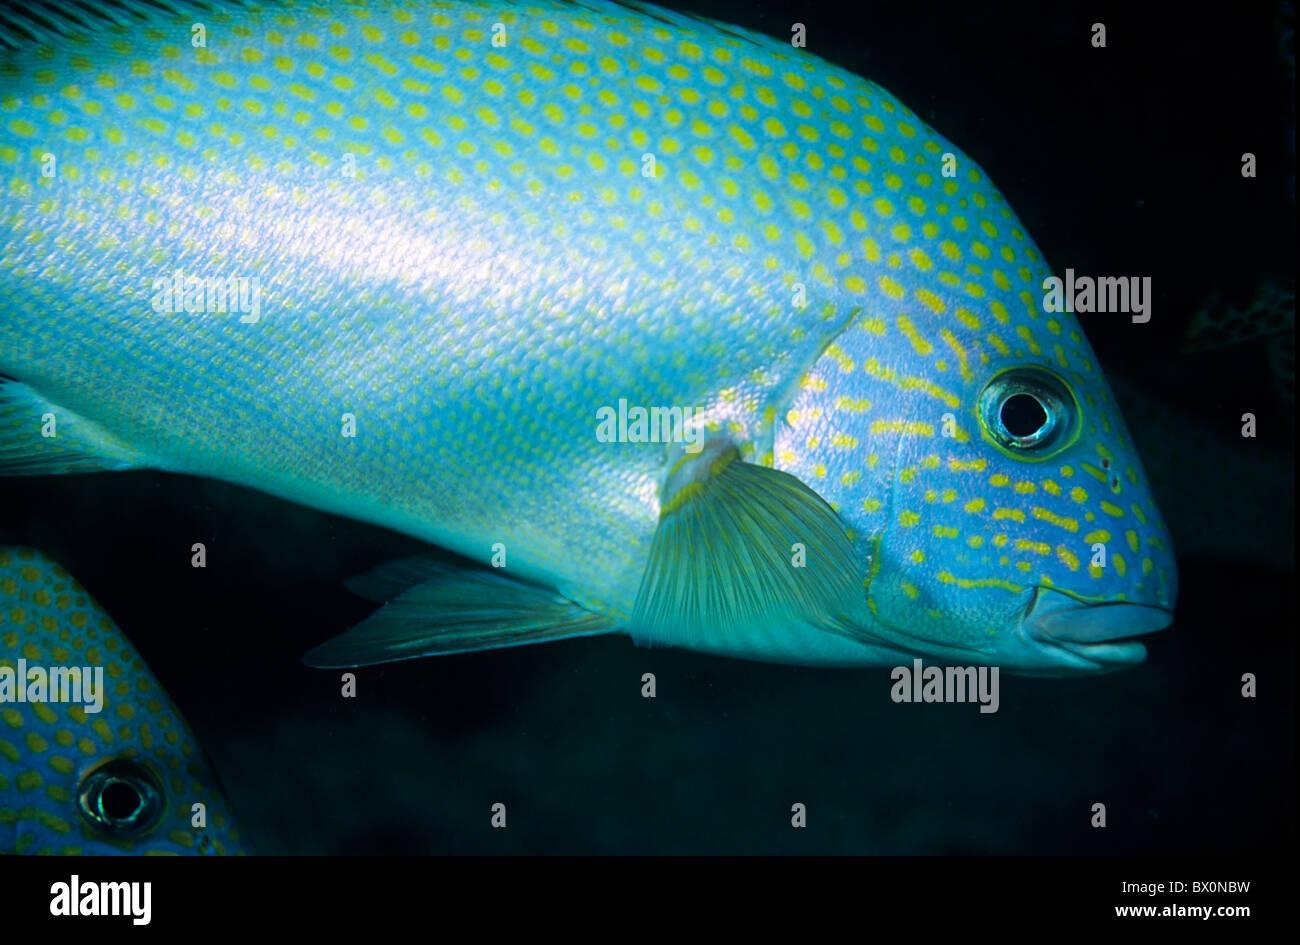 New Caledonia, Noumea Lagoon - Silver Sweetlips Fish Portrait Diagramma Pictum - Stock Image